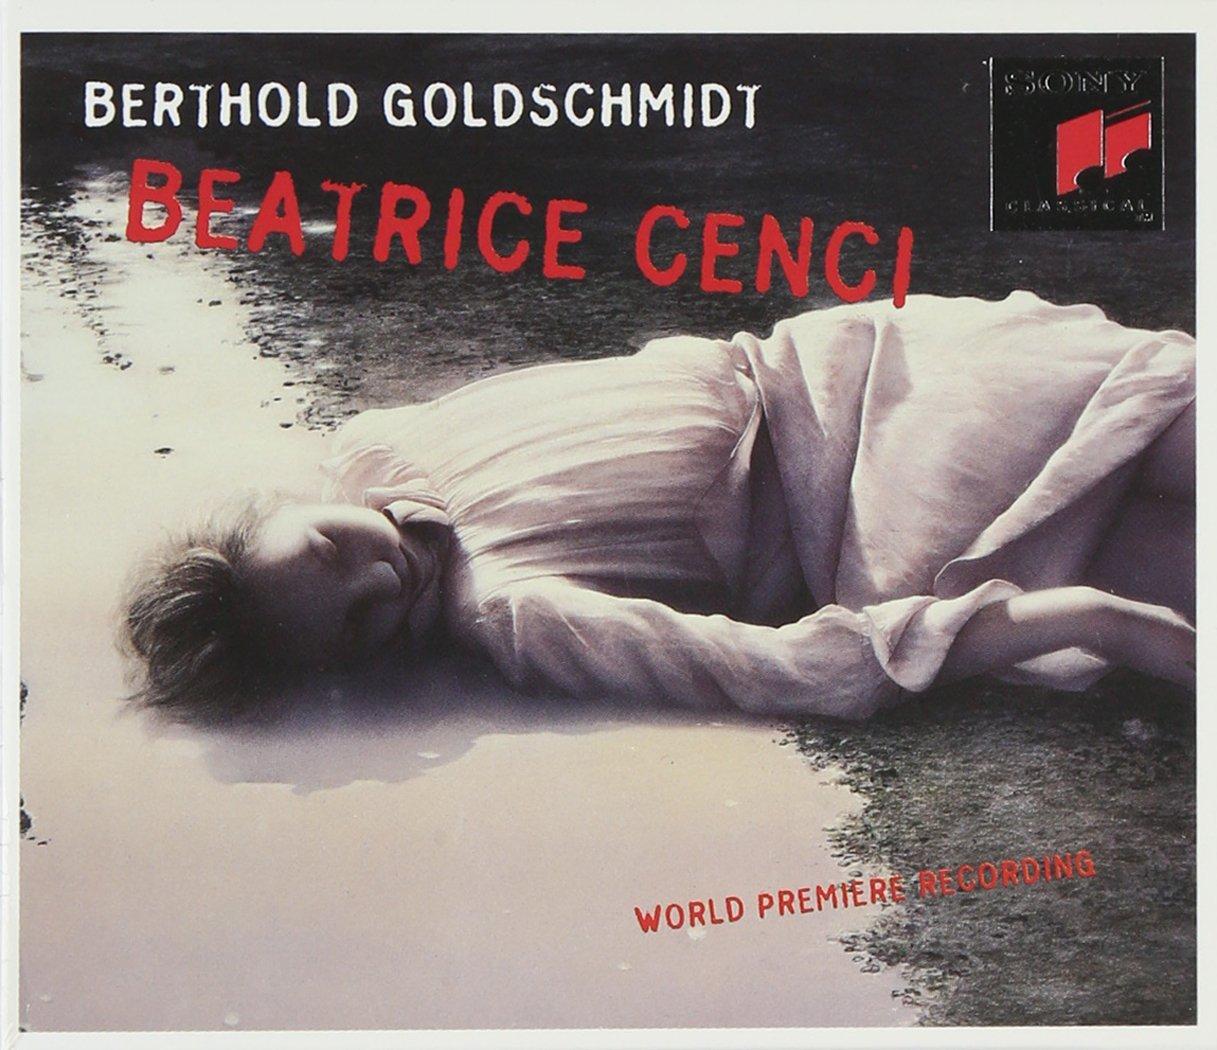 Entartet Beatrice Cenci